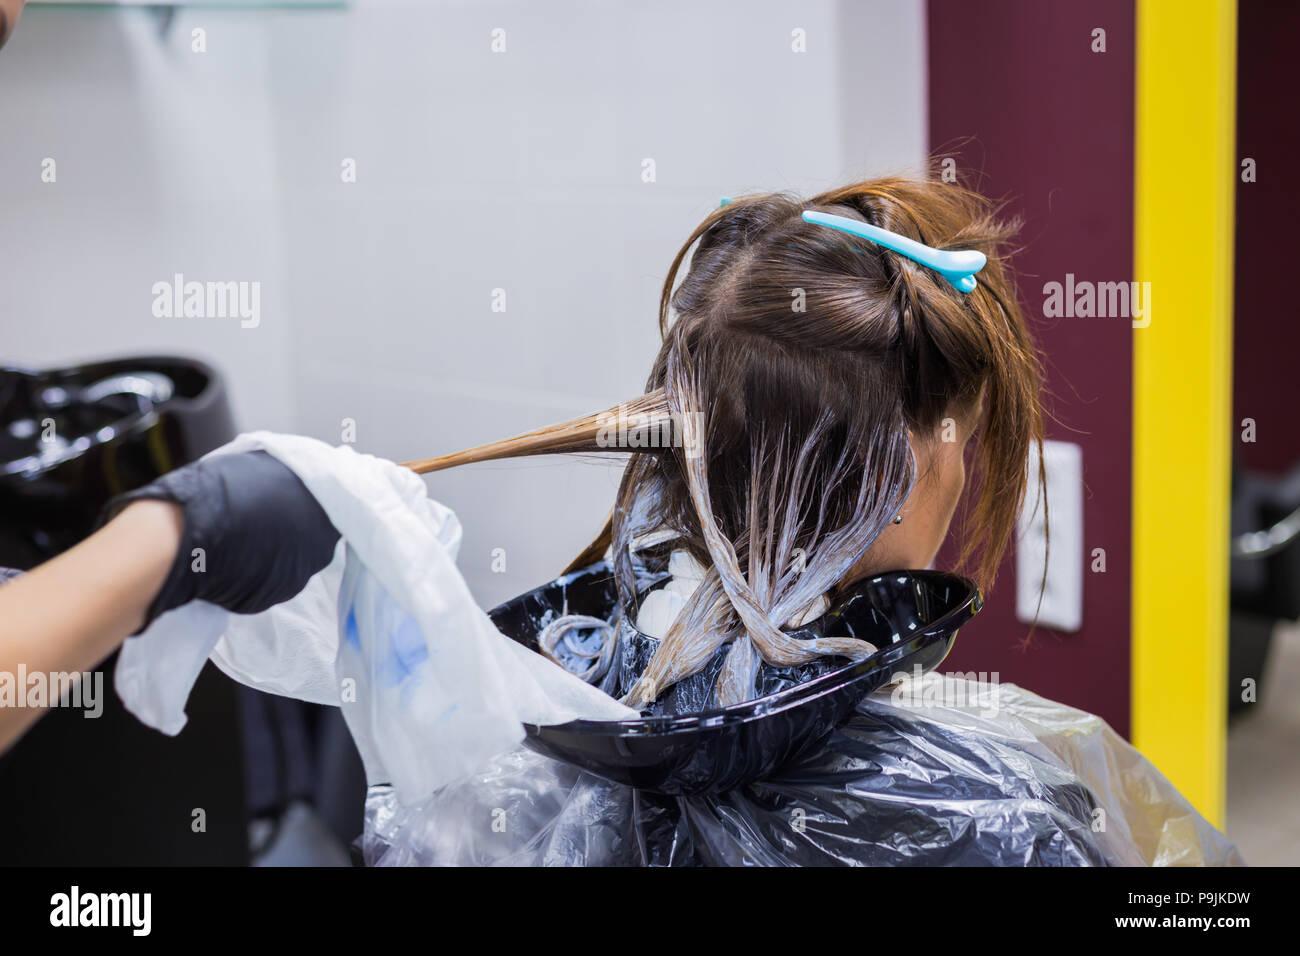 Hair Brush Arm Imágenes De Stock   Hair Brush Arm Fotos De Stock - Alamy b17dde1903a1